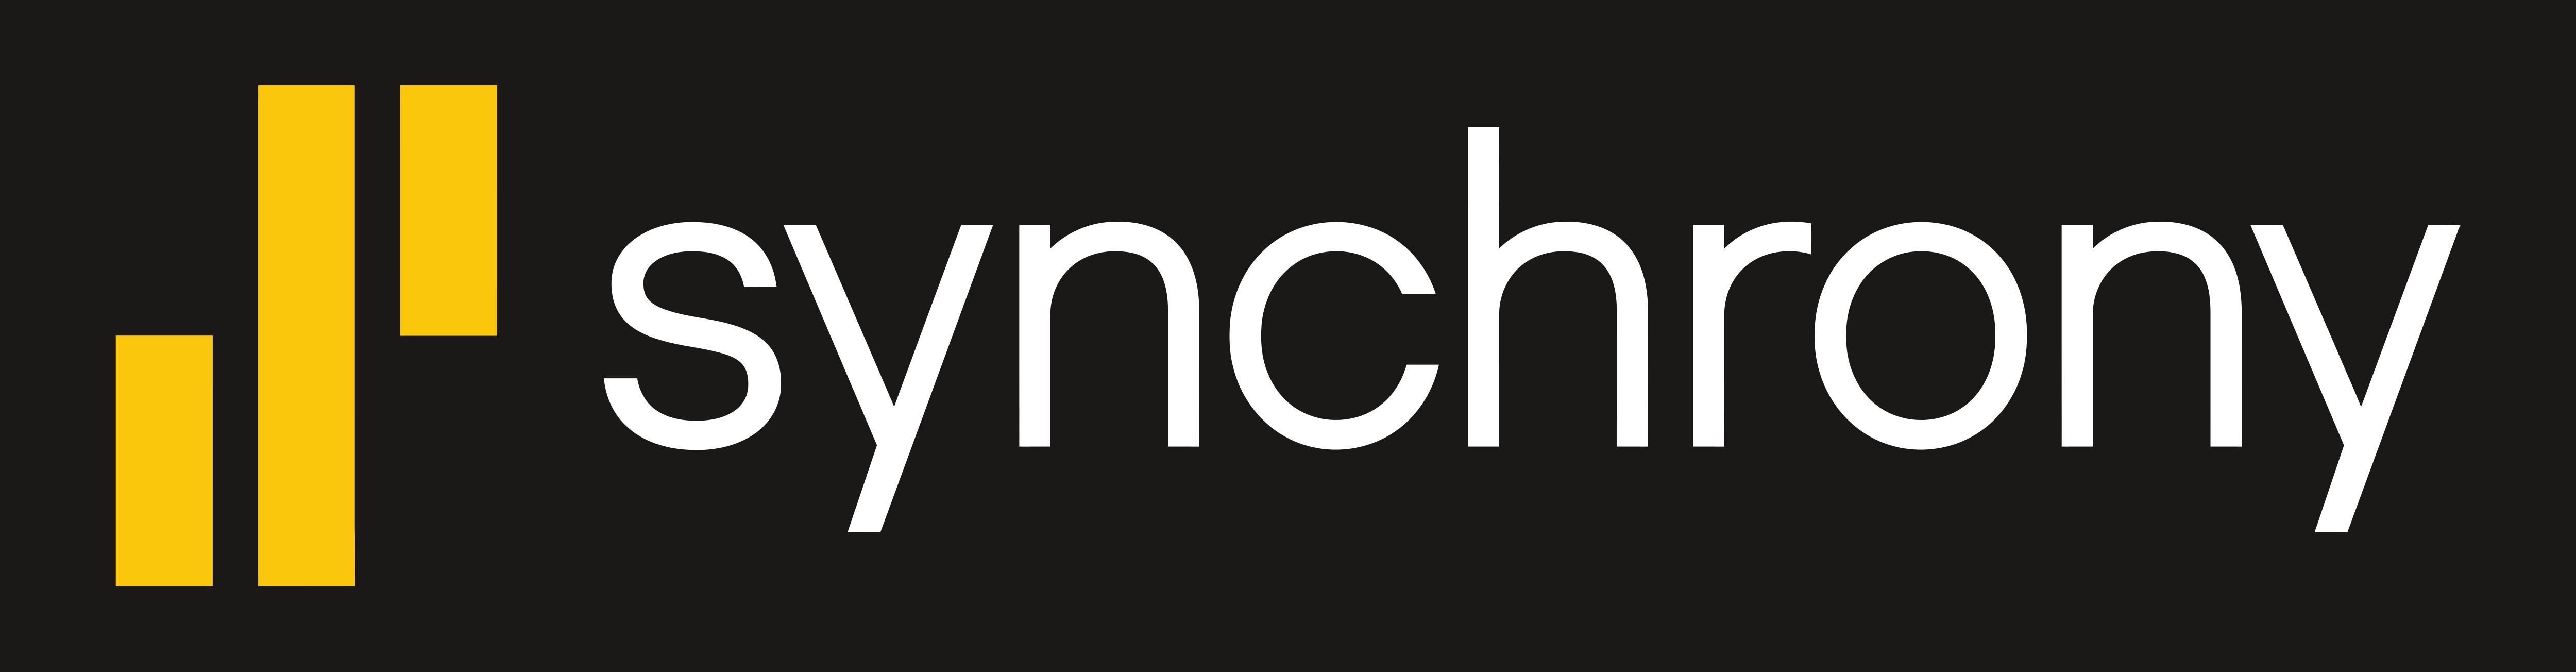 Synchrony Financial – Logos Download